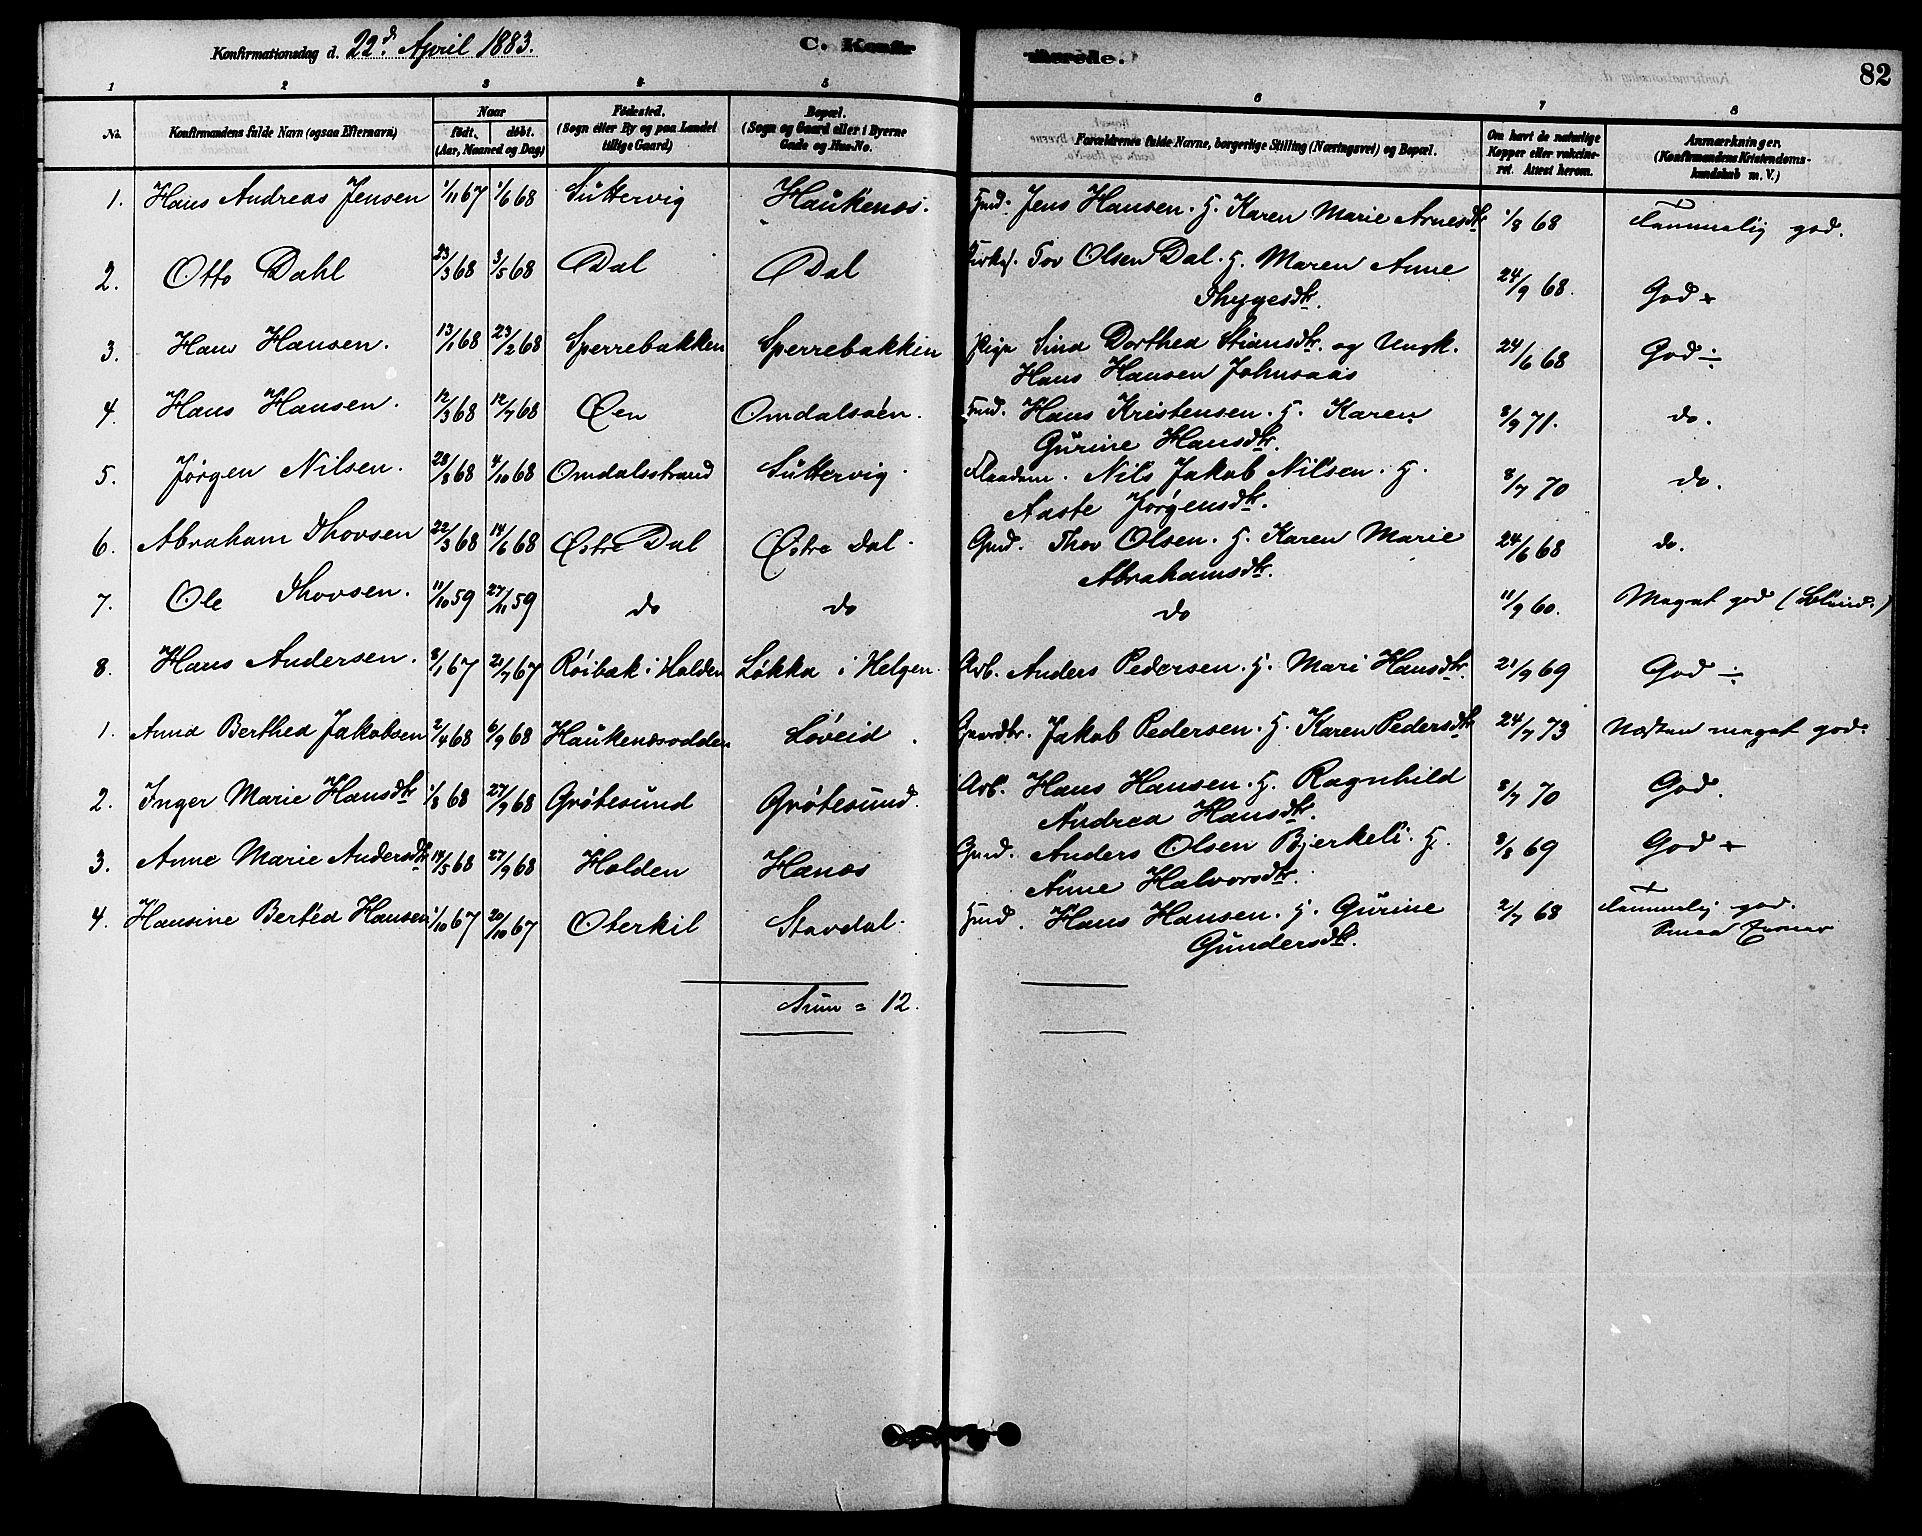 SAKO, Solum kirkebøker, F/Fb/L0001: Ministerialbok nr. II 1, 1877-1892, s. 82